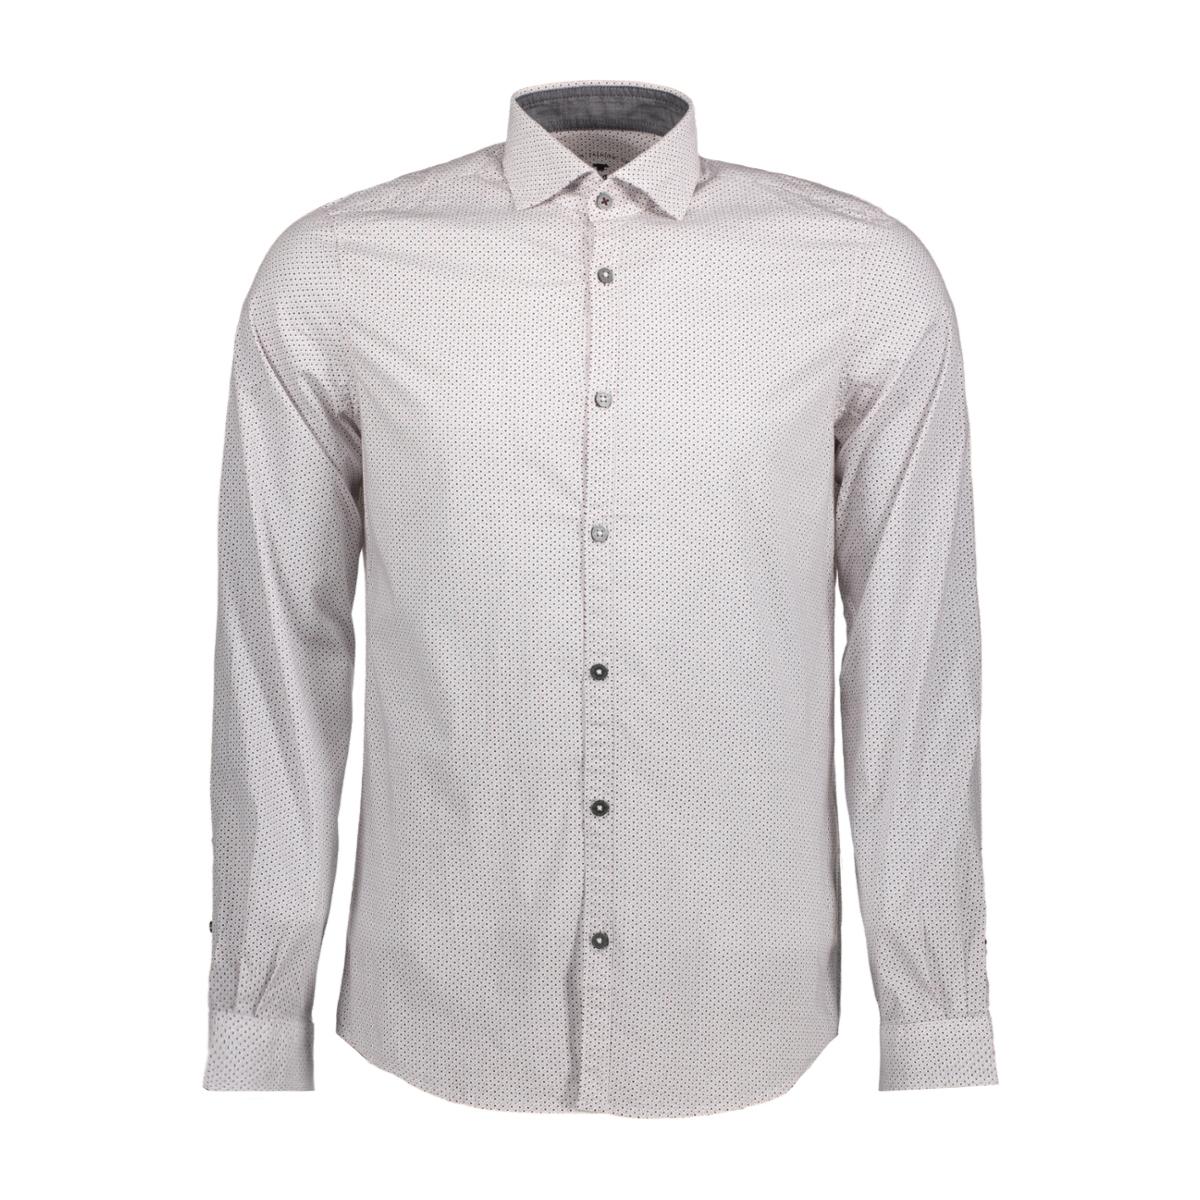 2033778.00.10 tom tailor overhemd 2000